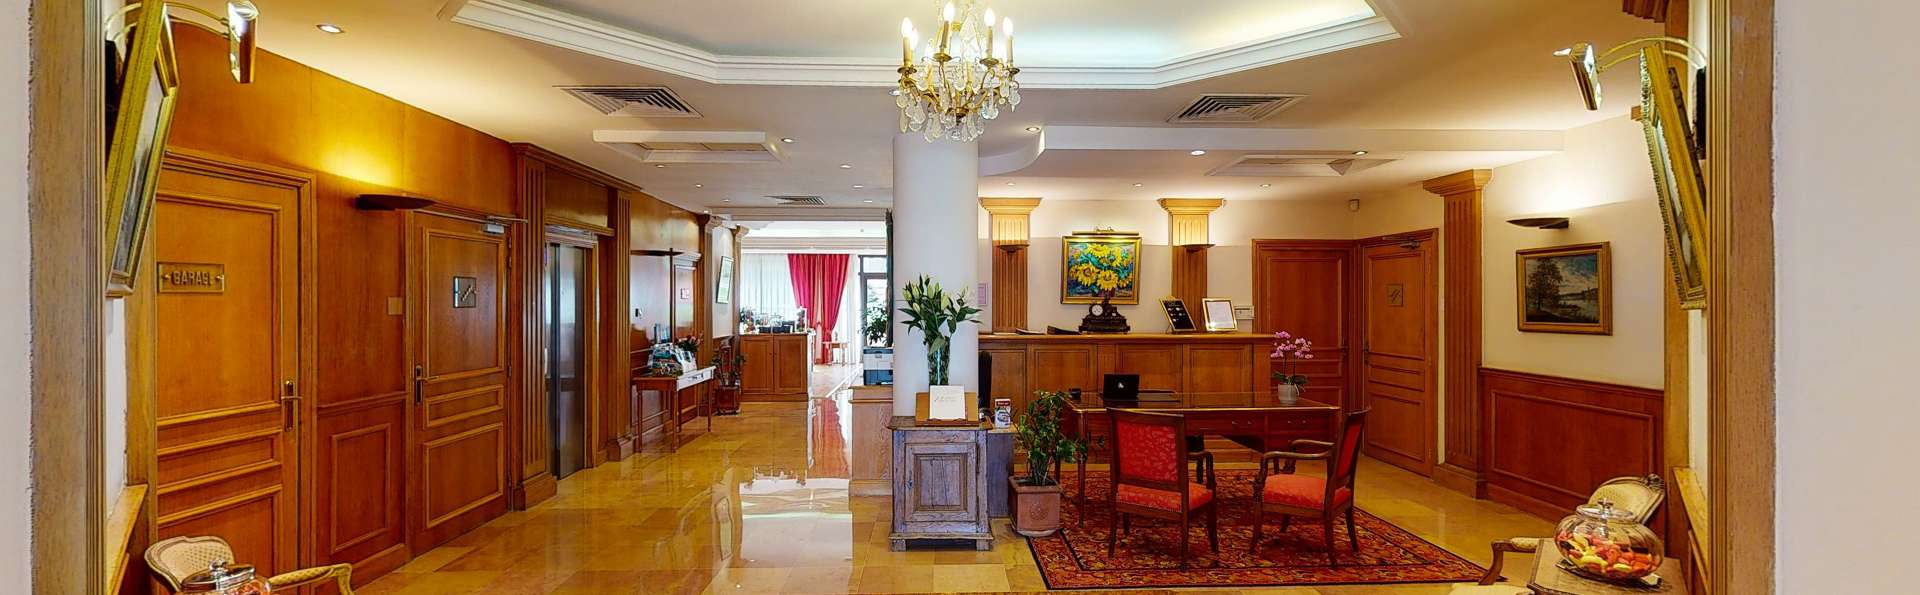 Hôtel Sun Riviera - Hotel_Sun_Riviera_Lobby_-_6.jpg